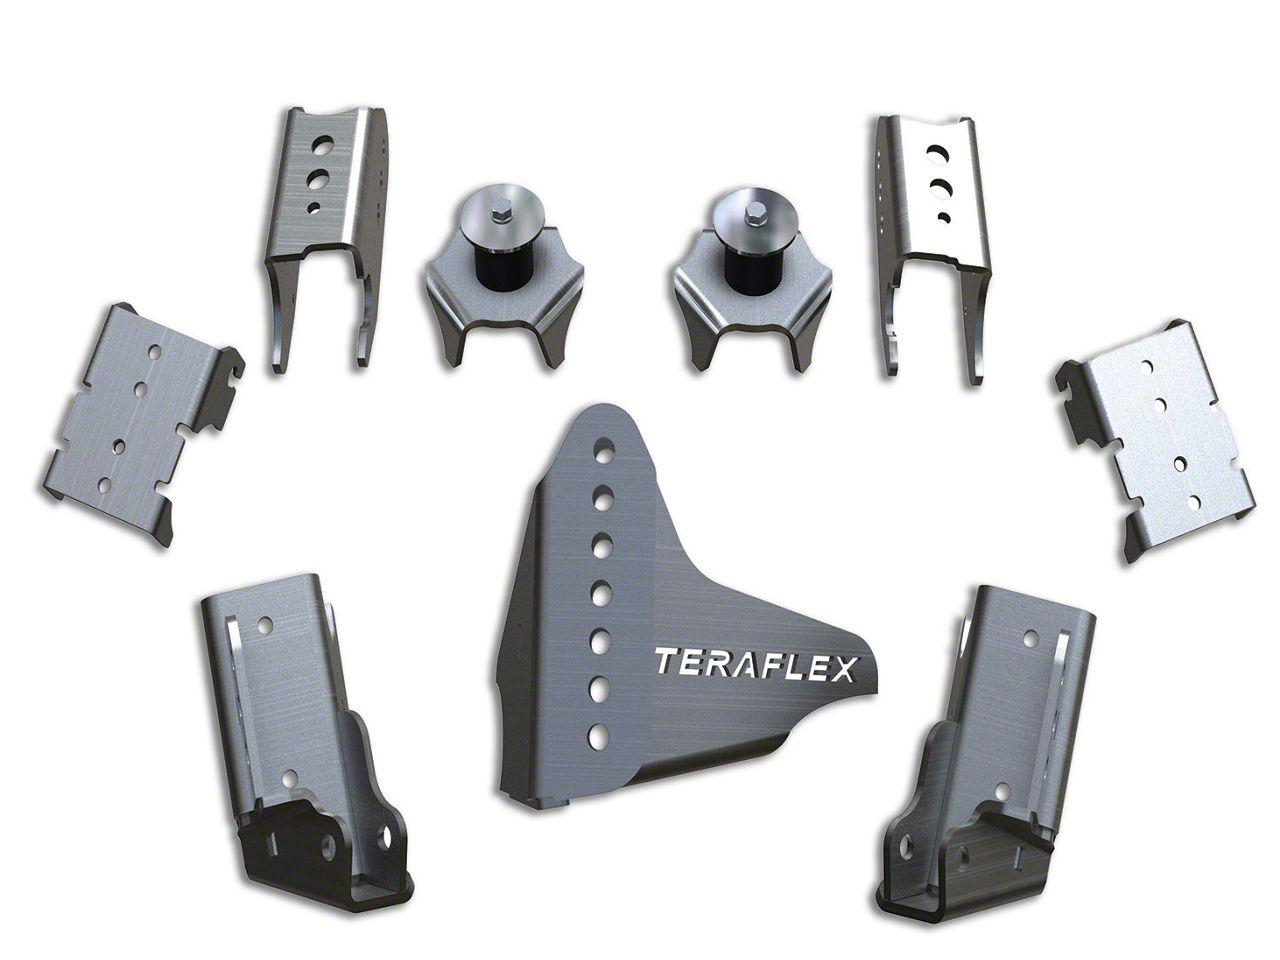 Teraflex Rear CRD60 Axle Bracket Kit (07-18 Jeep Wrangler JK)